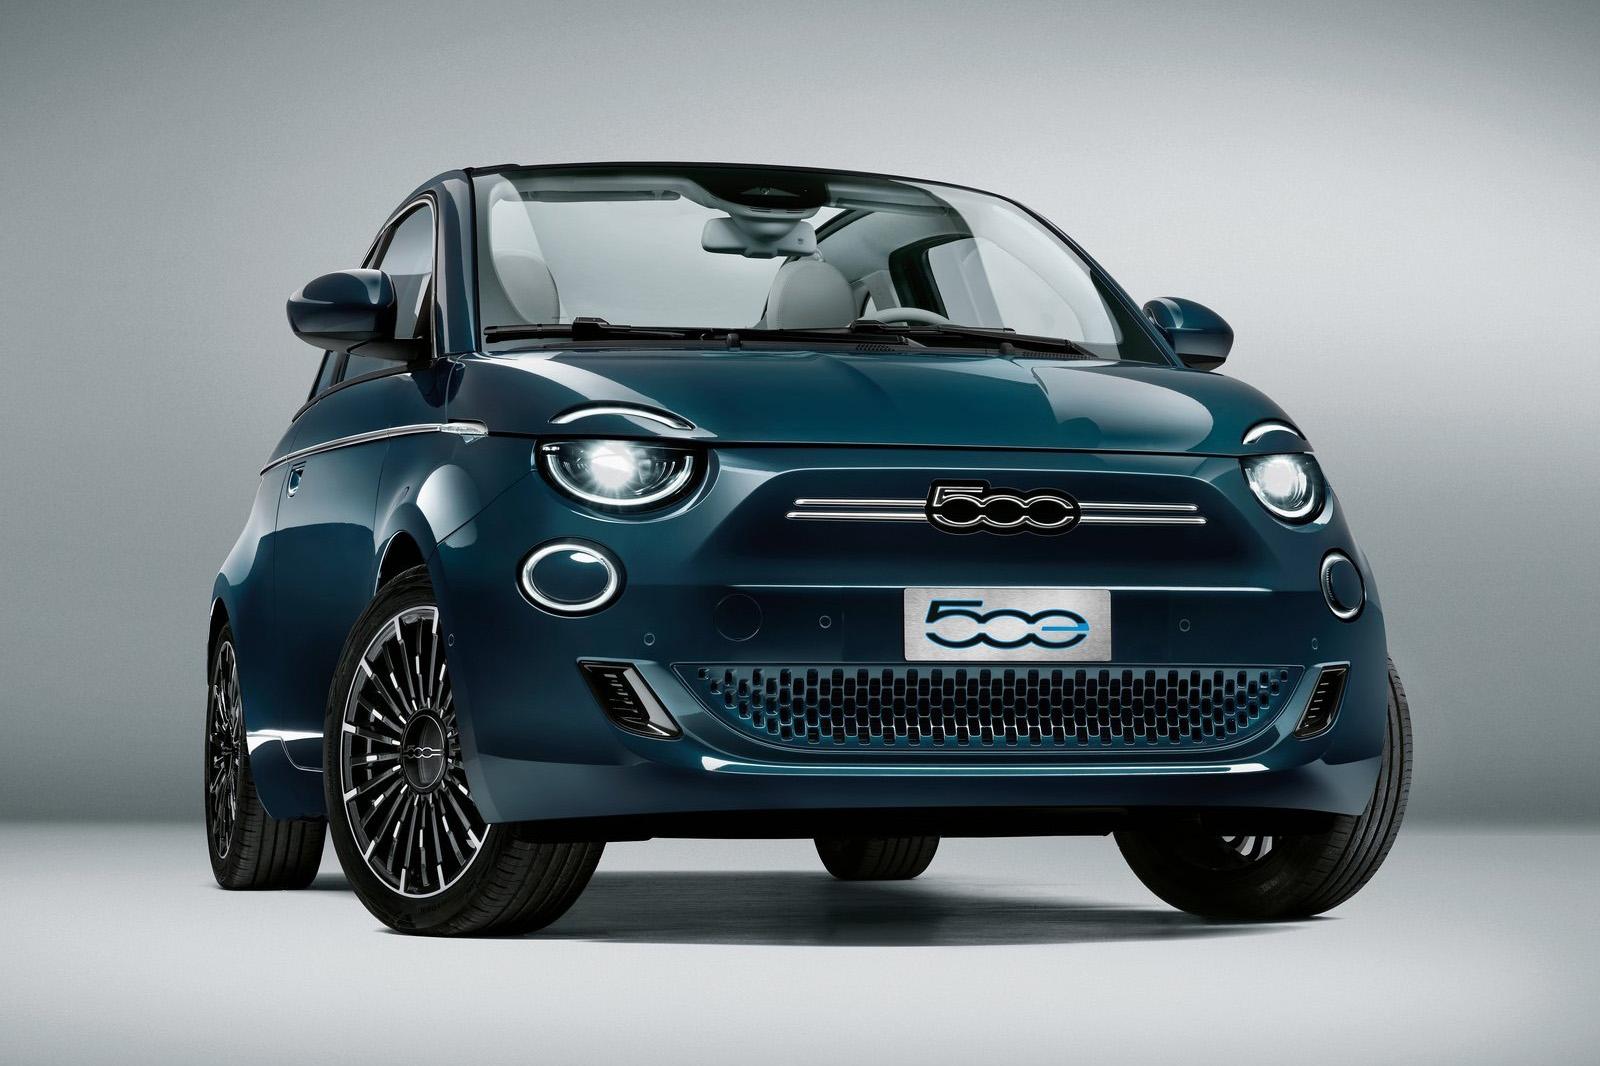 2021 Fiat 500 electric Cabrio